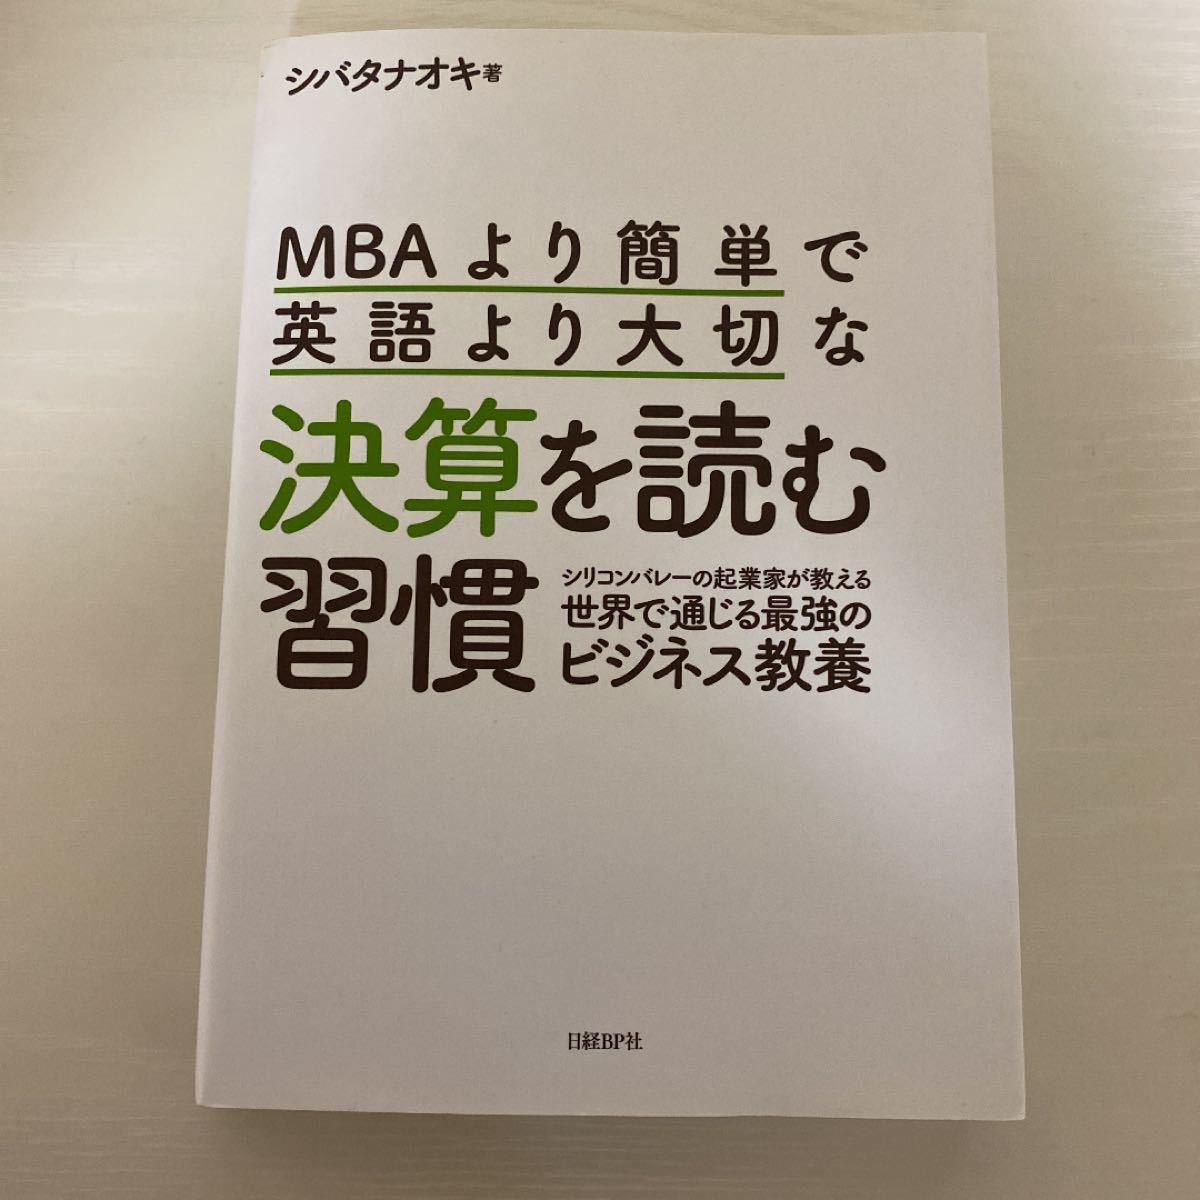 MBAより簡単で英語より大切な決算を読む習慣 シリコンバレーの起業家が教える世界で通じる最強のビジネス教養/シバタナオキ